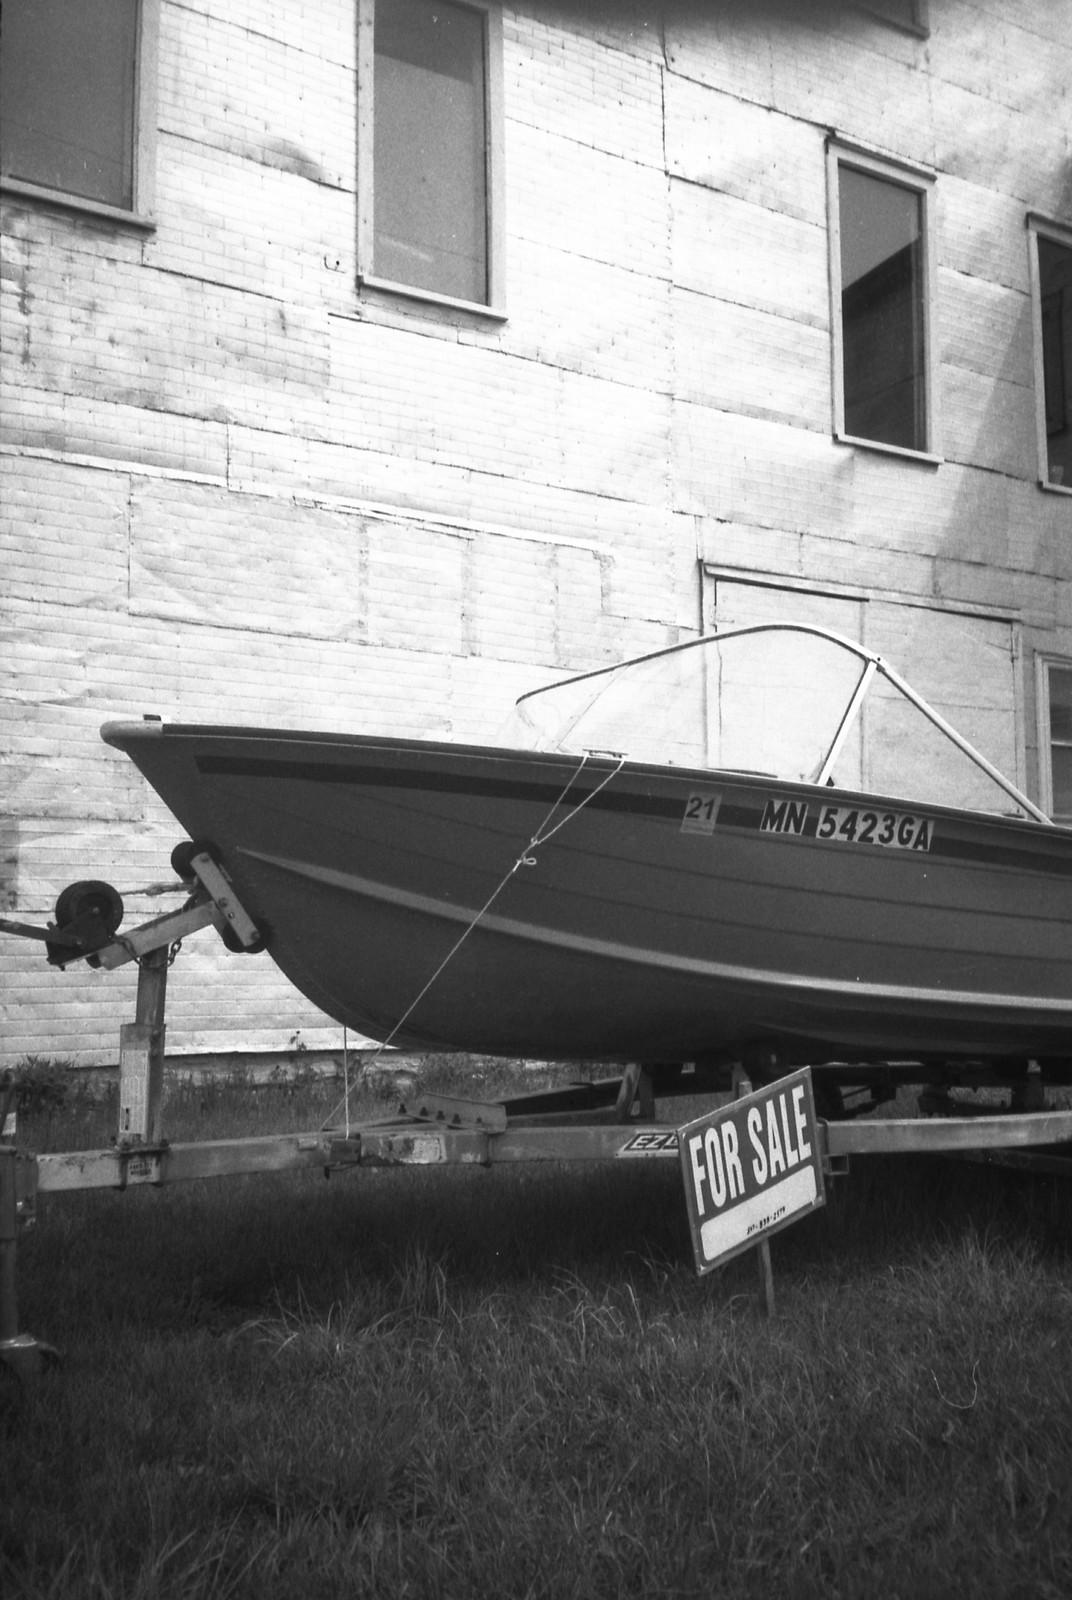 Boat for Sale, Minneapolis MN [Olympus XA / Kentmere 400]